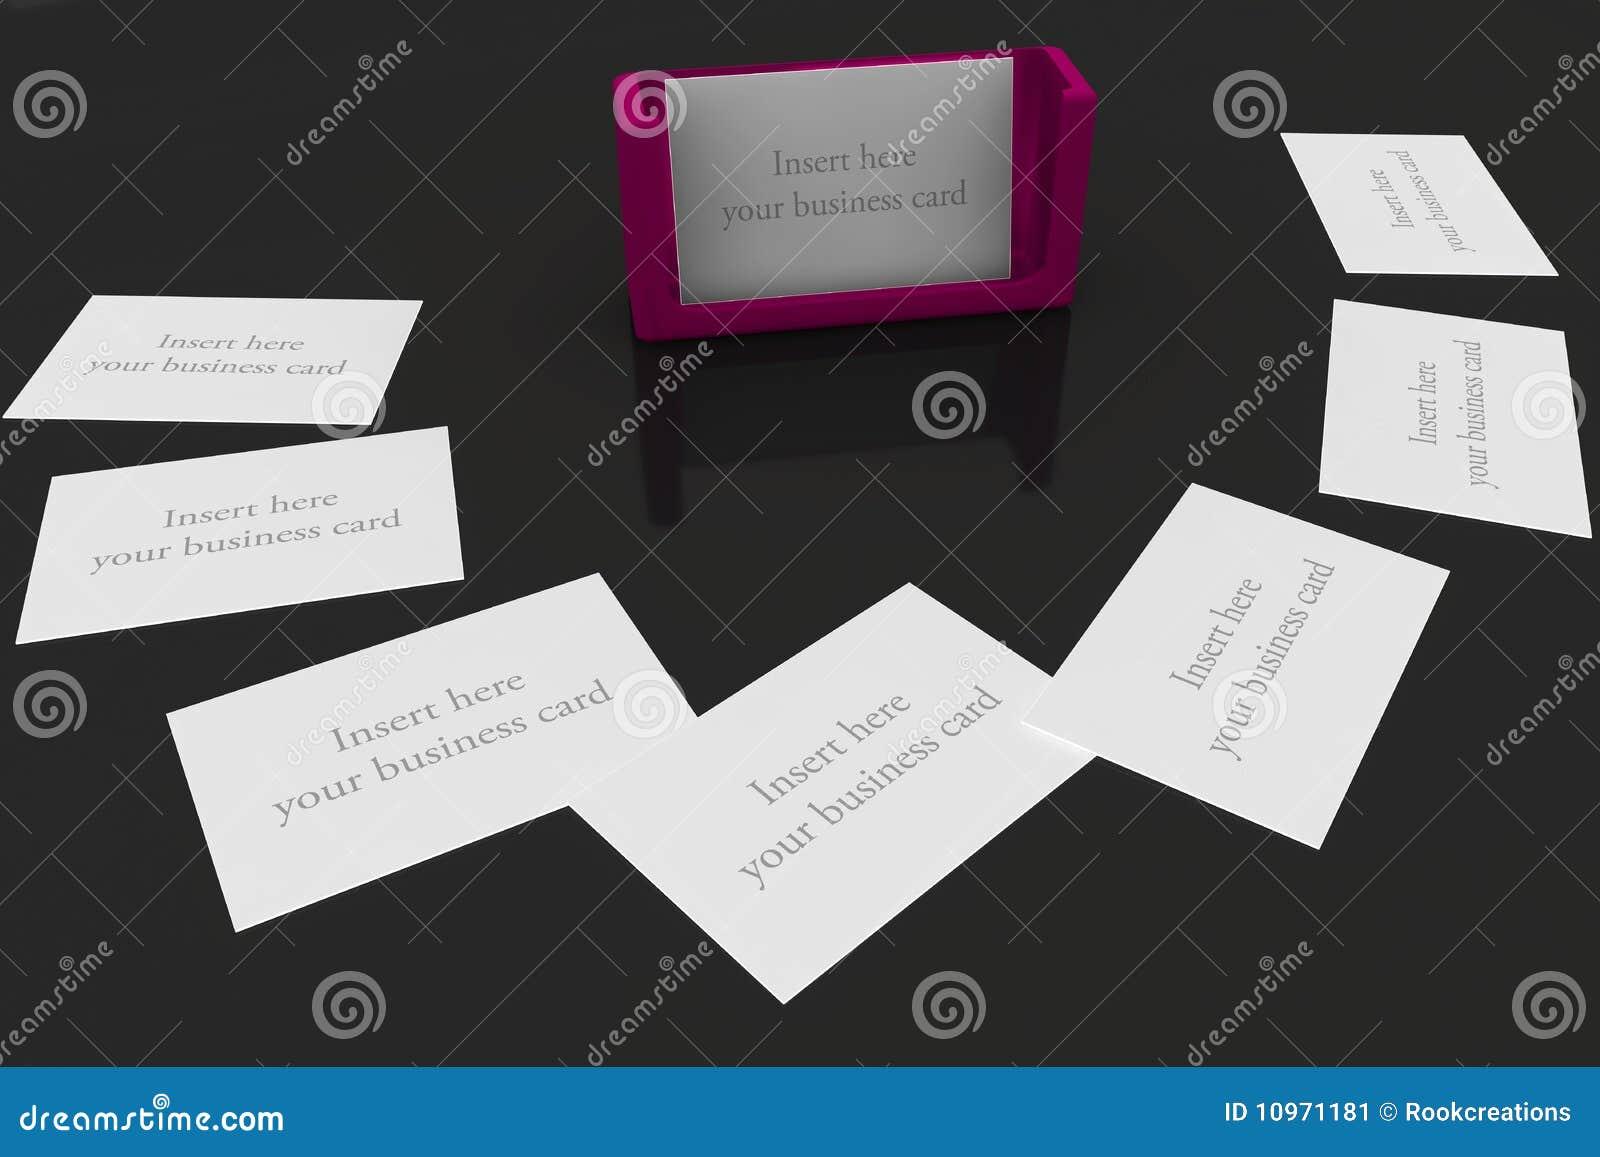 Purple Business Card Holder Stock Illustration - Illustration of ...